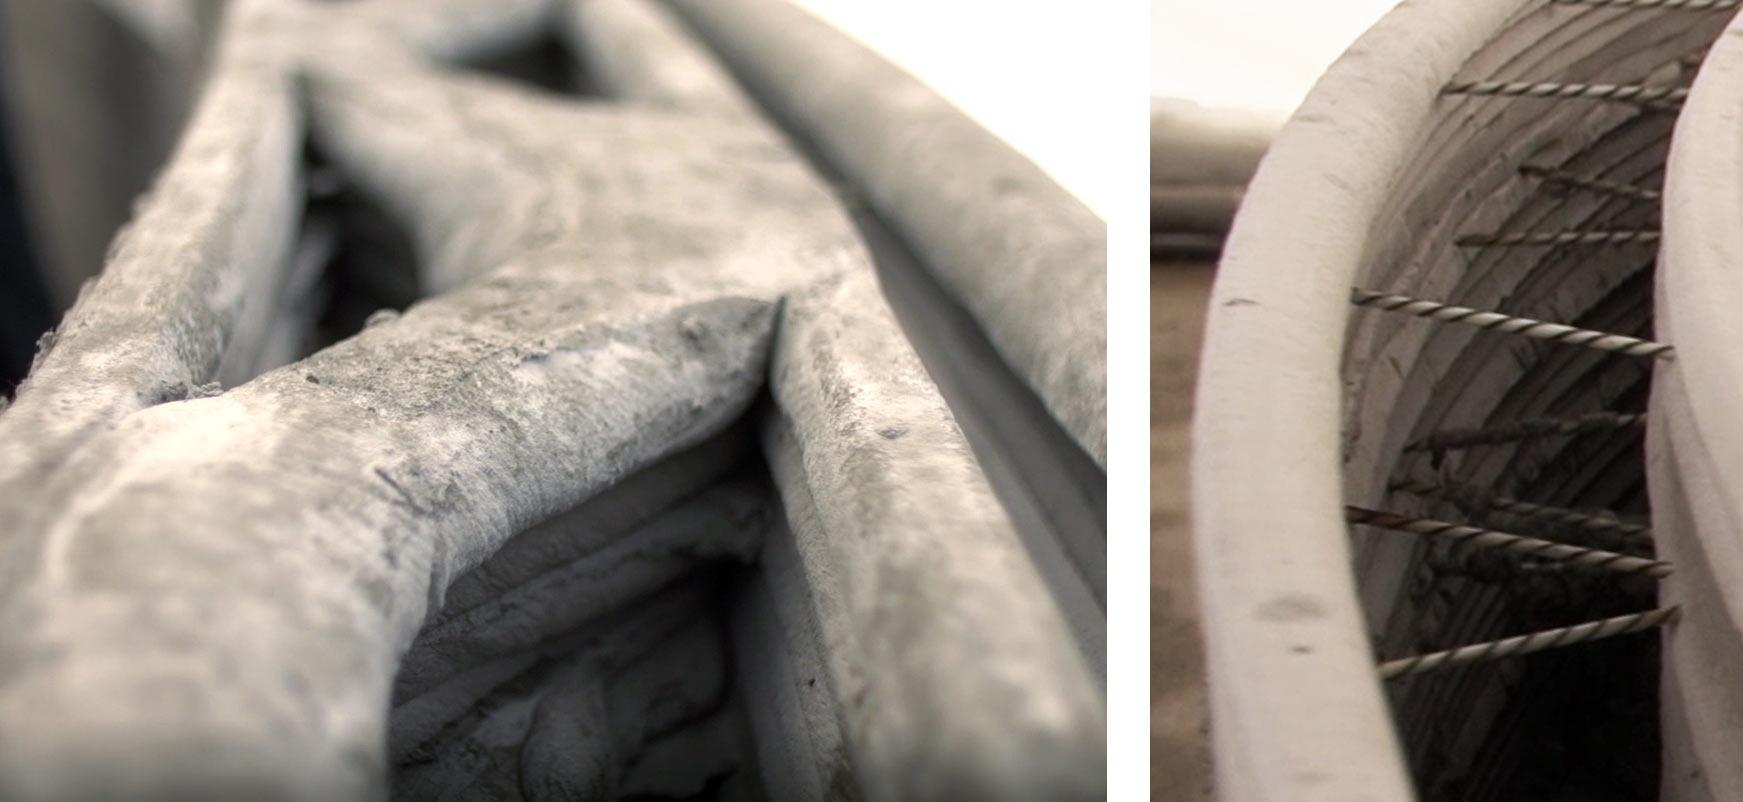 ApisCor-3D-Printed-House-Printing-Process-3